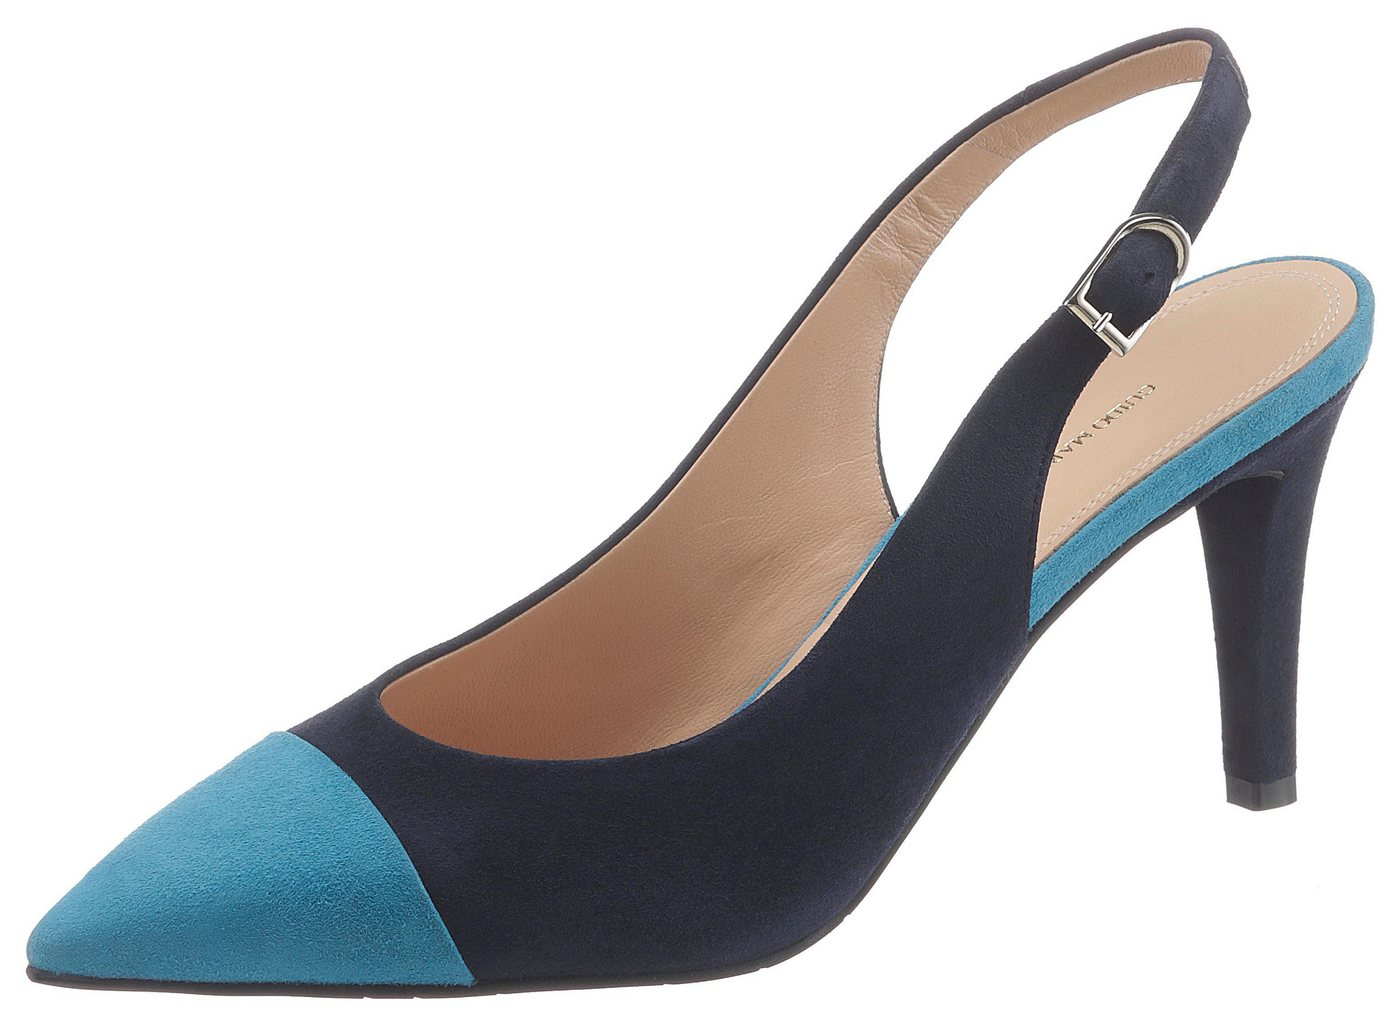 GUIDO MARIA KRETSCHMER Slingpumps in spitz zulaufender Form | Schuhe > Pumps > Slingpumps | Blau | Leder | GUIDO MARIA KRETSCHMER